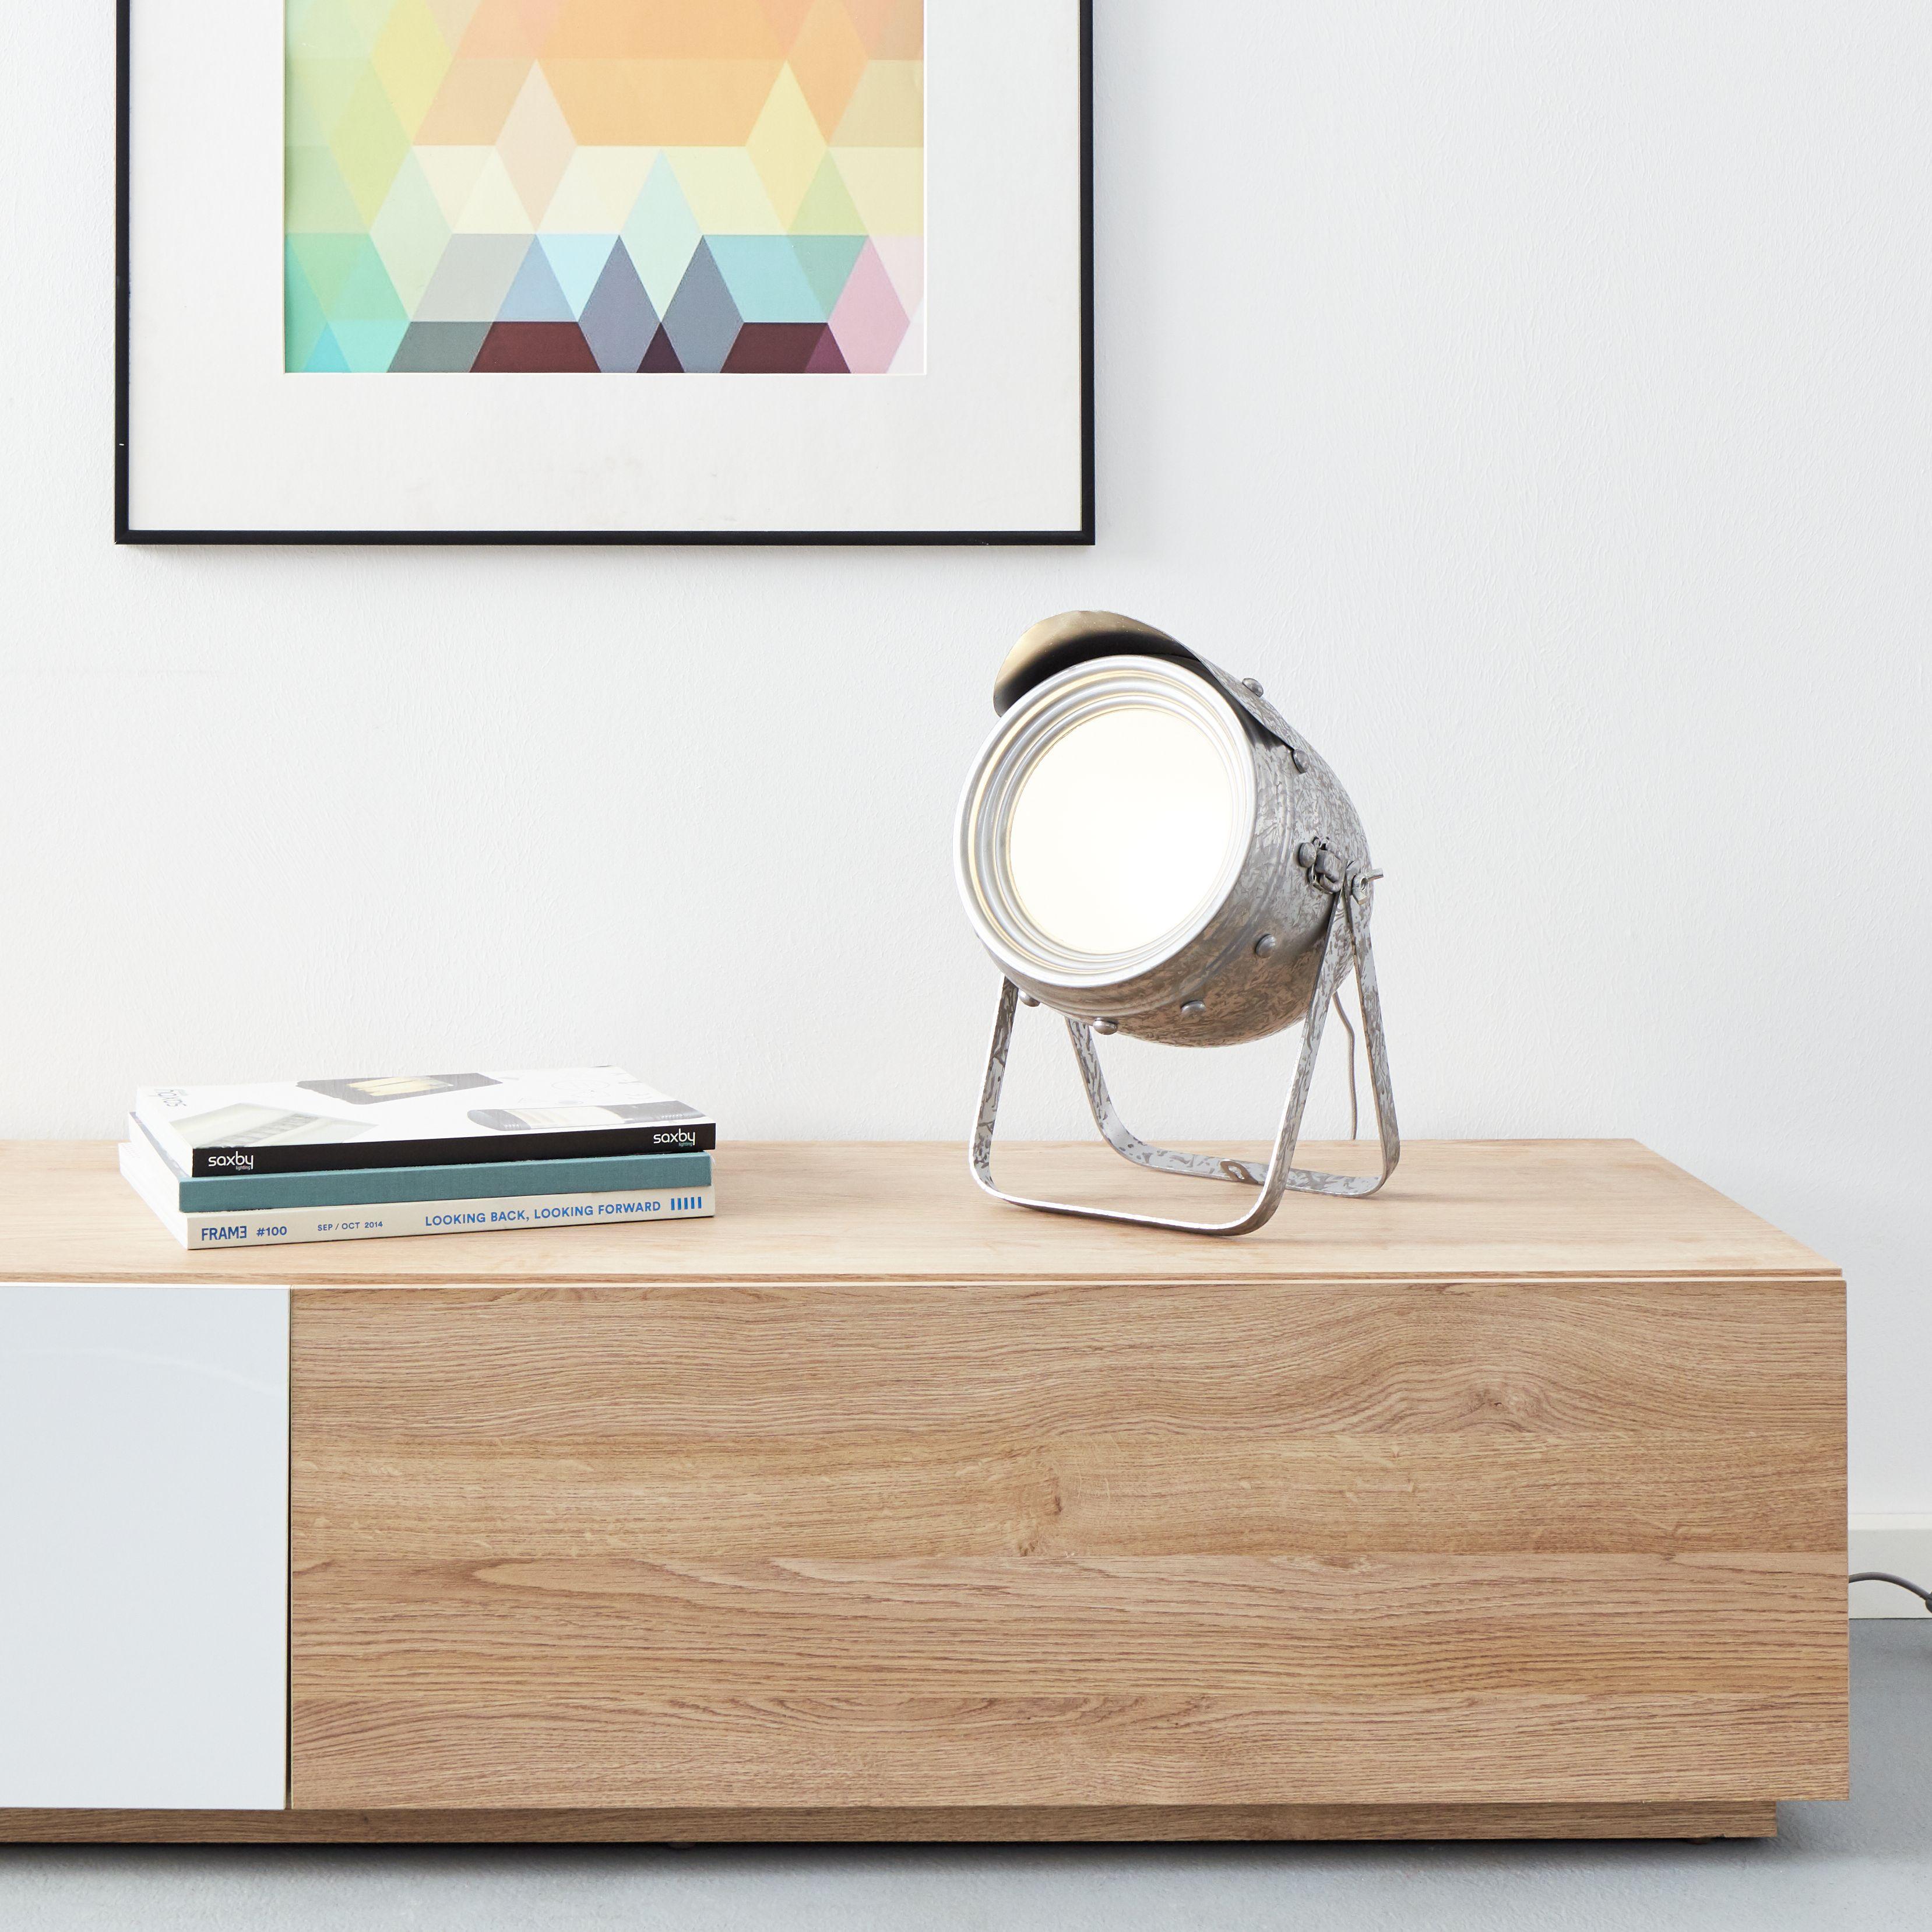 Lampe Max60wMétal Antique 25cm1x Poser VerreZinc À E27 OPk8nXNw0